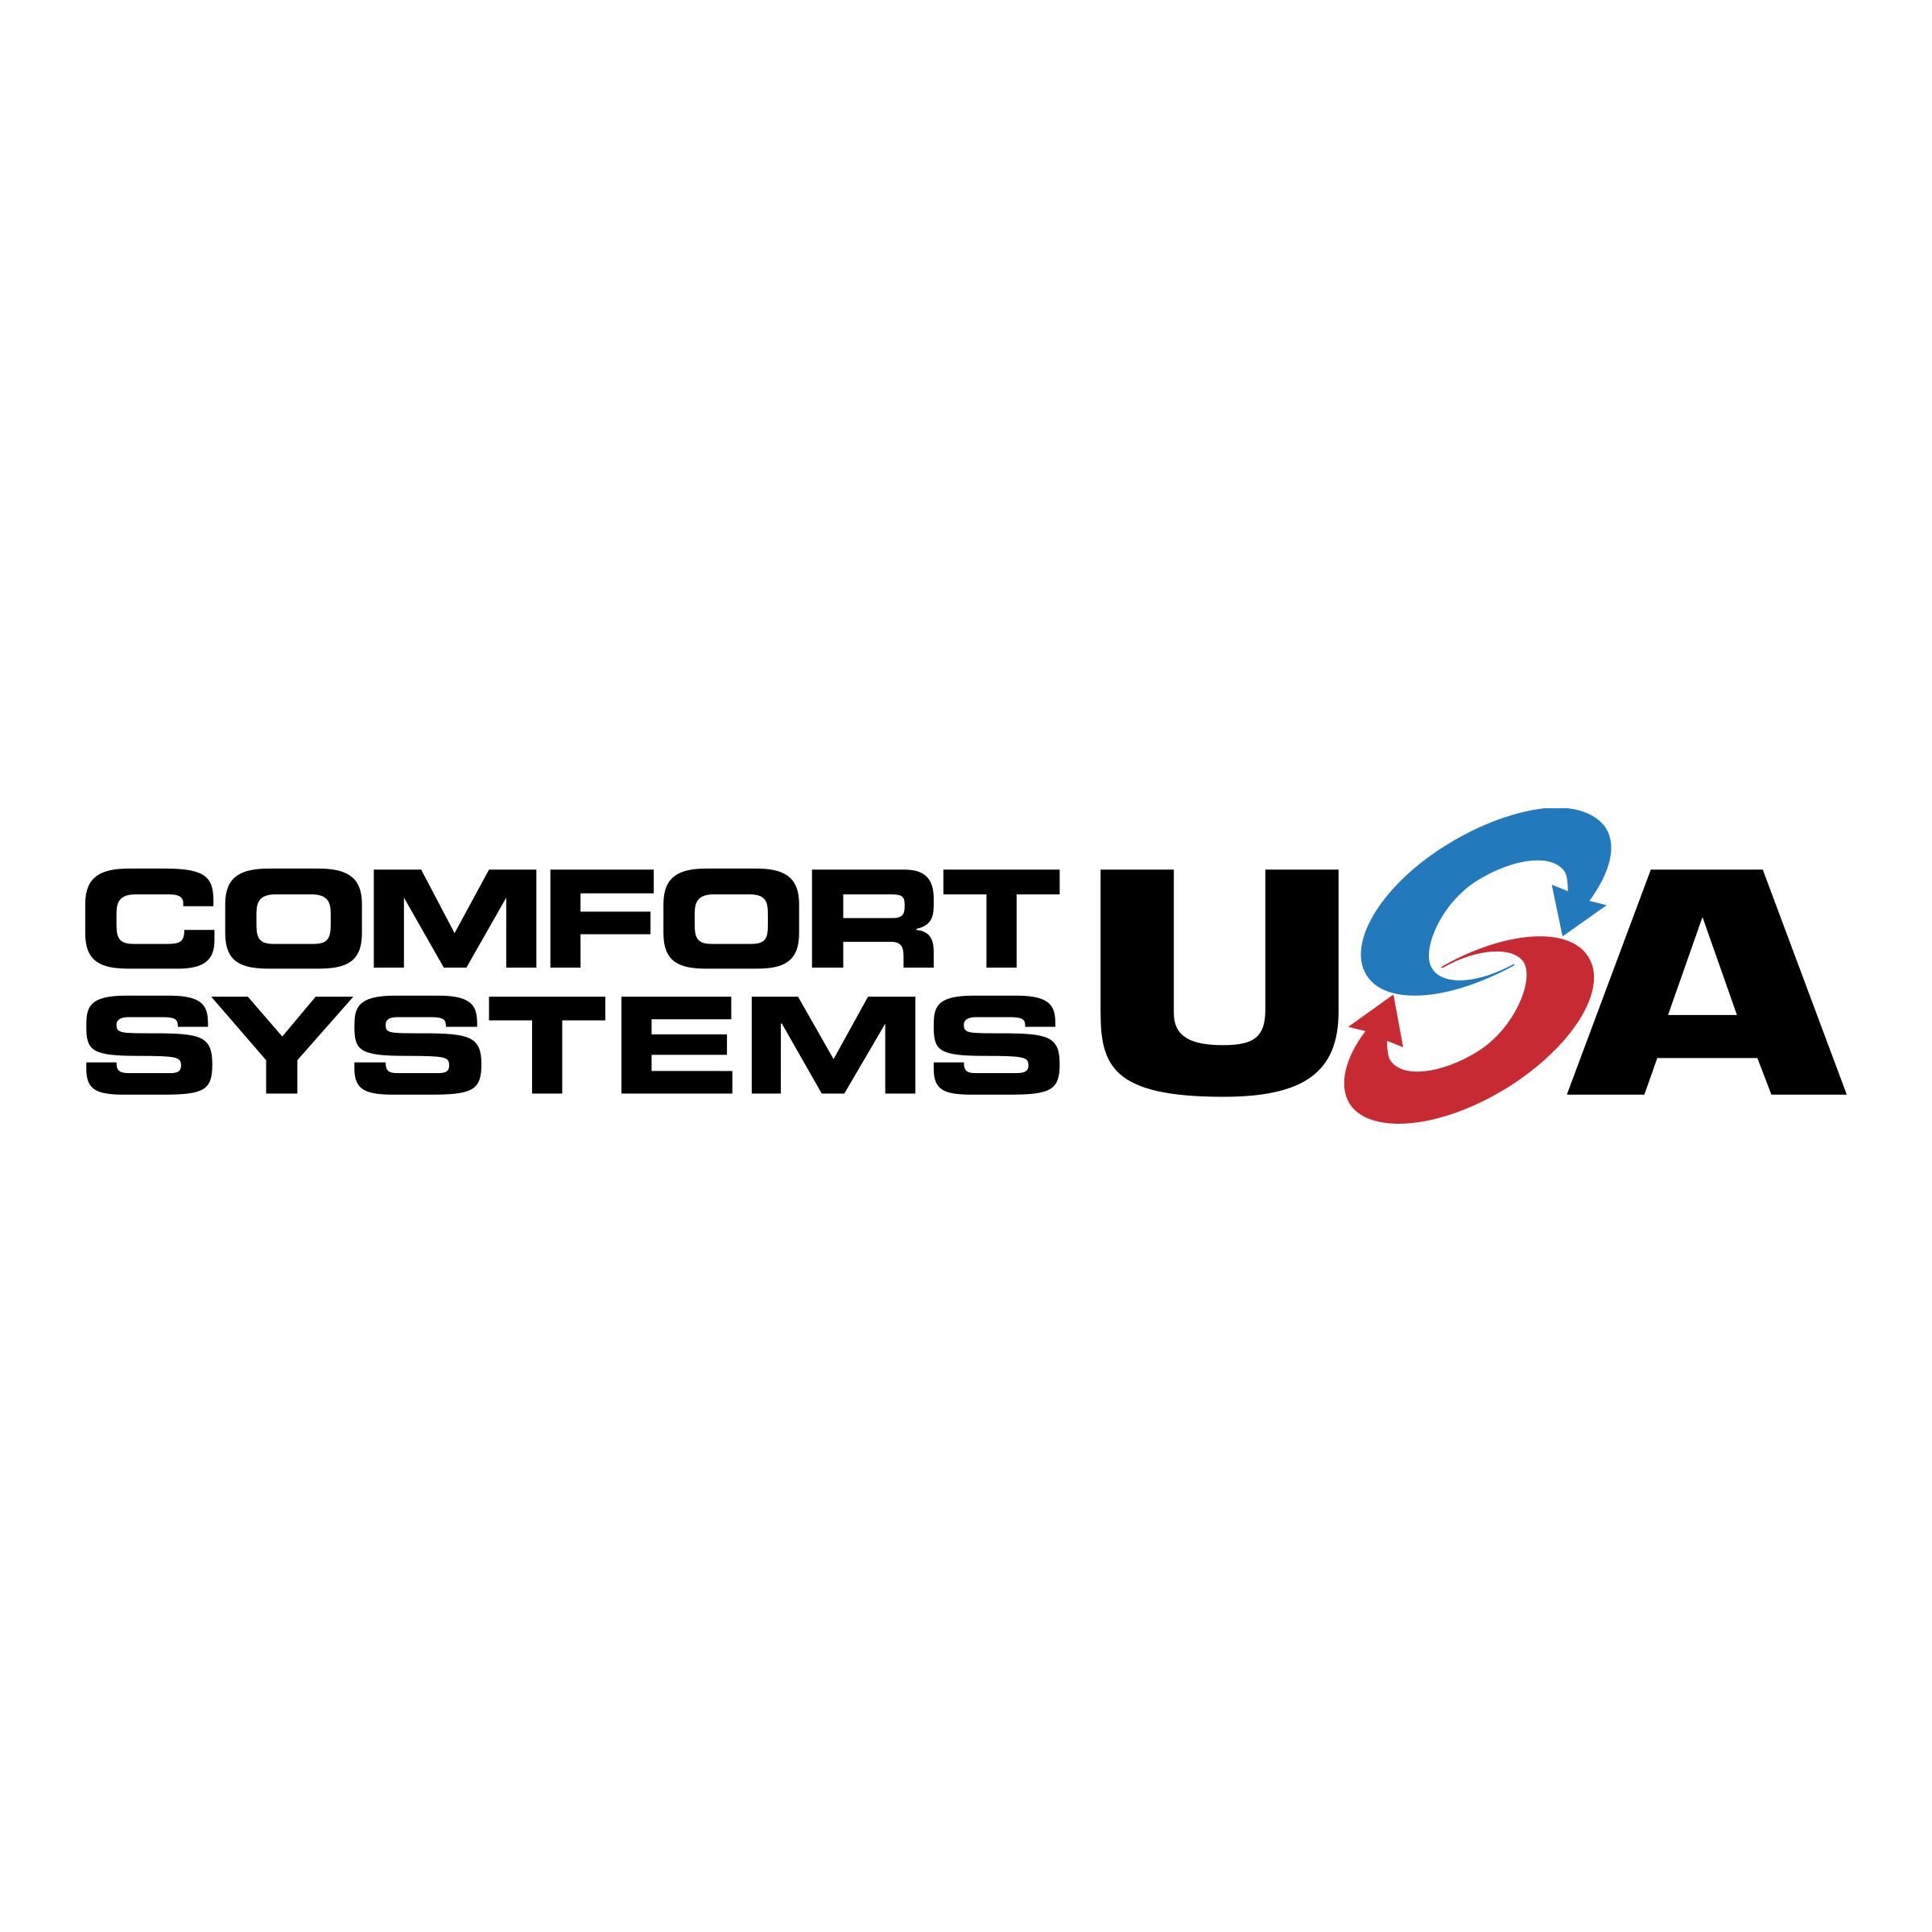 Comfort Systems USA Logo PNG Transparent & SVG Vector.